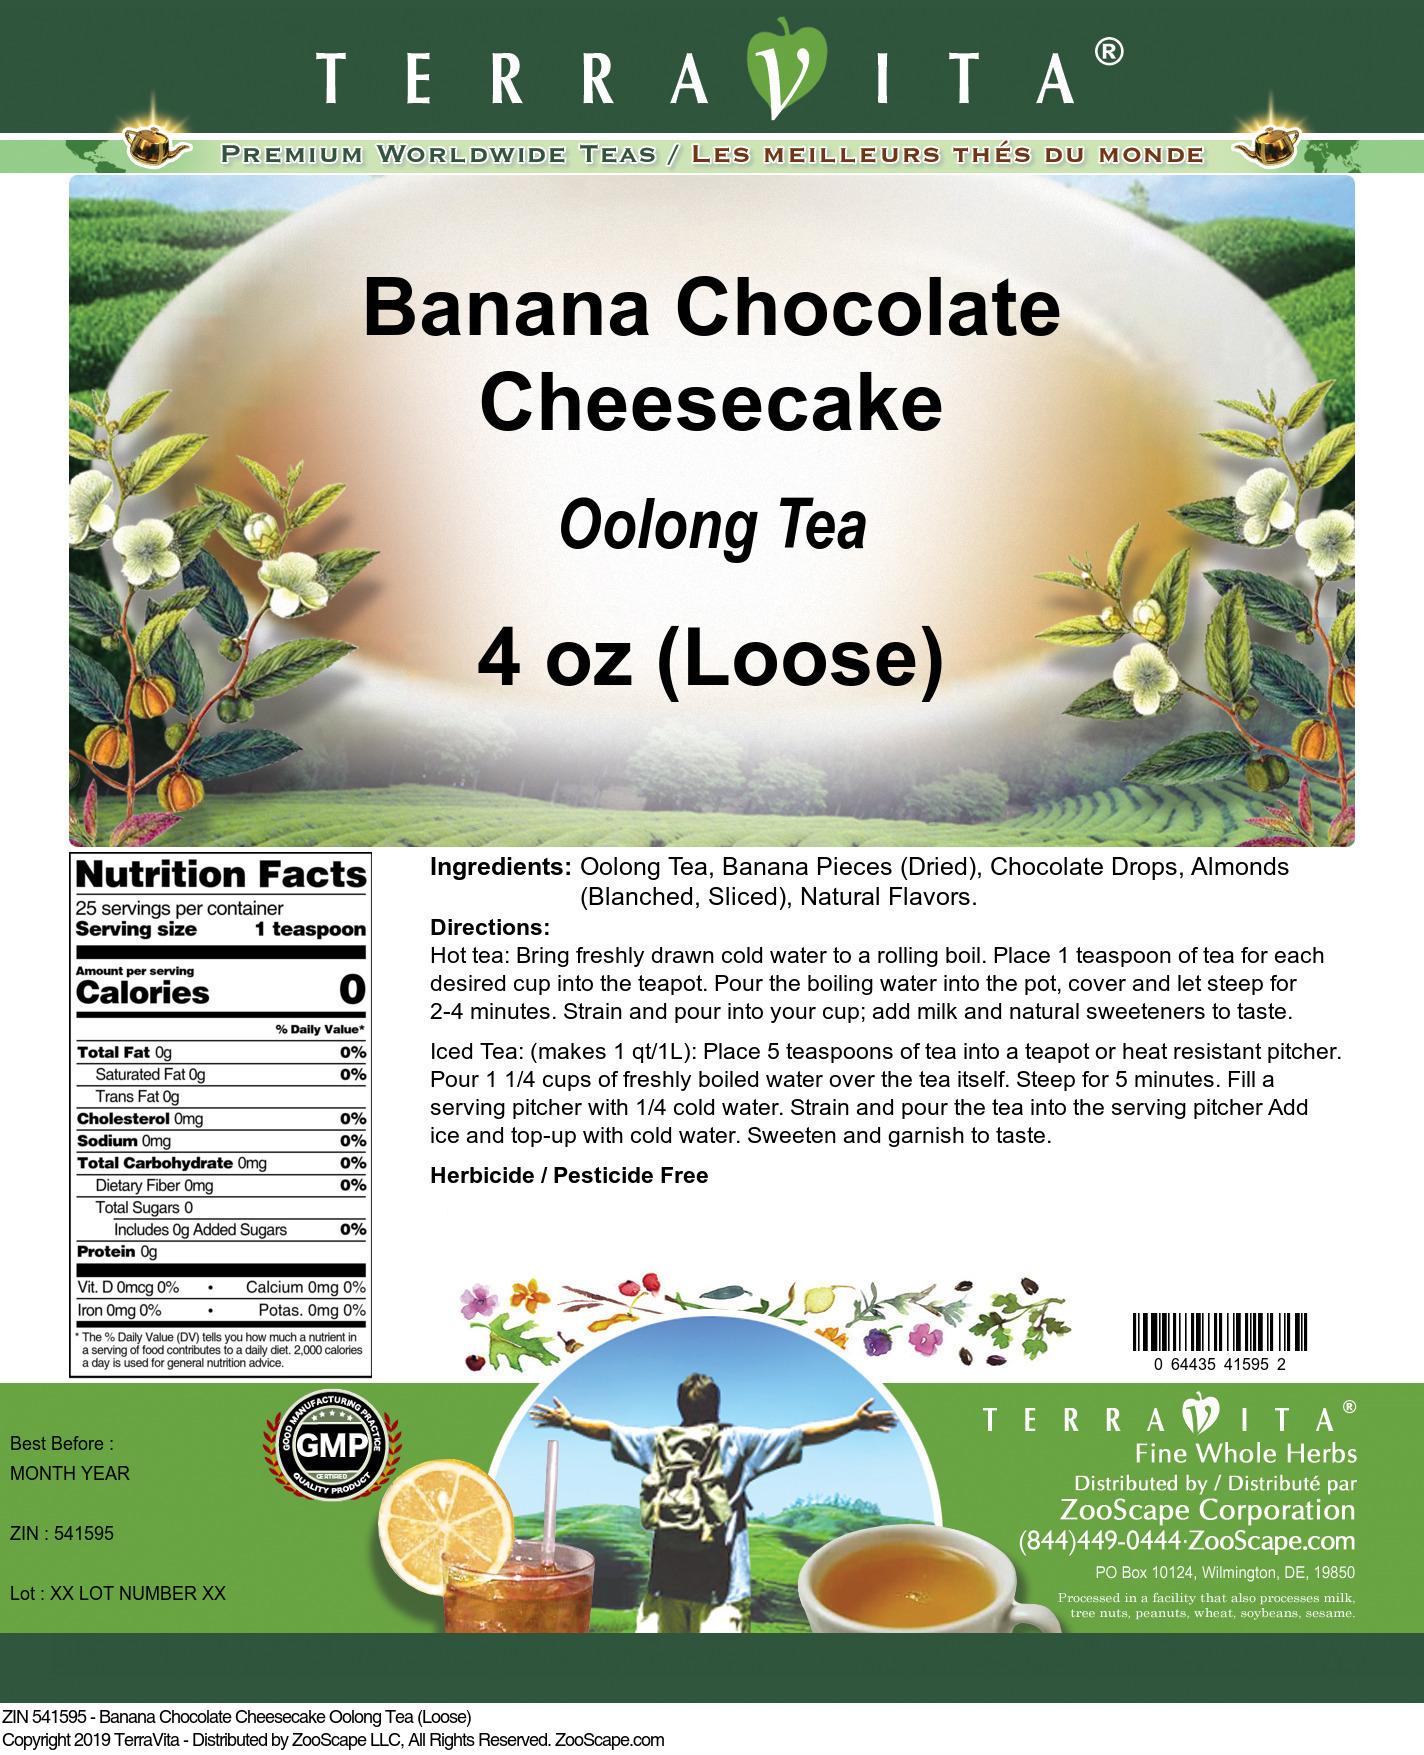 Banana Chocolate Cheesecake Oolong Tea (Loose)